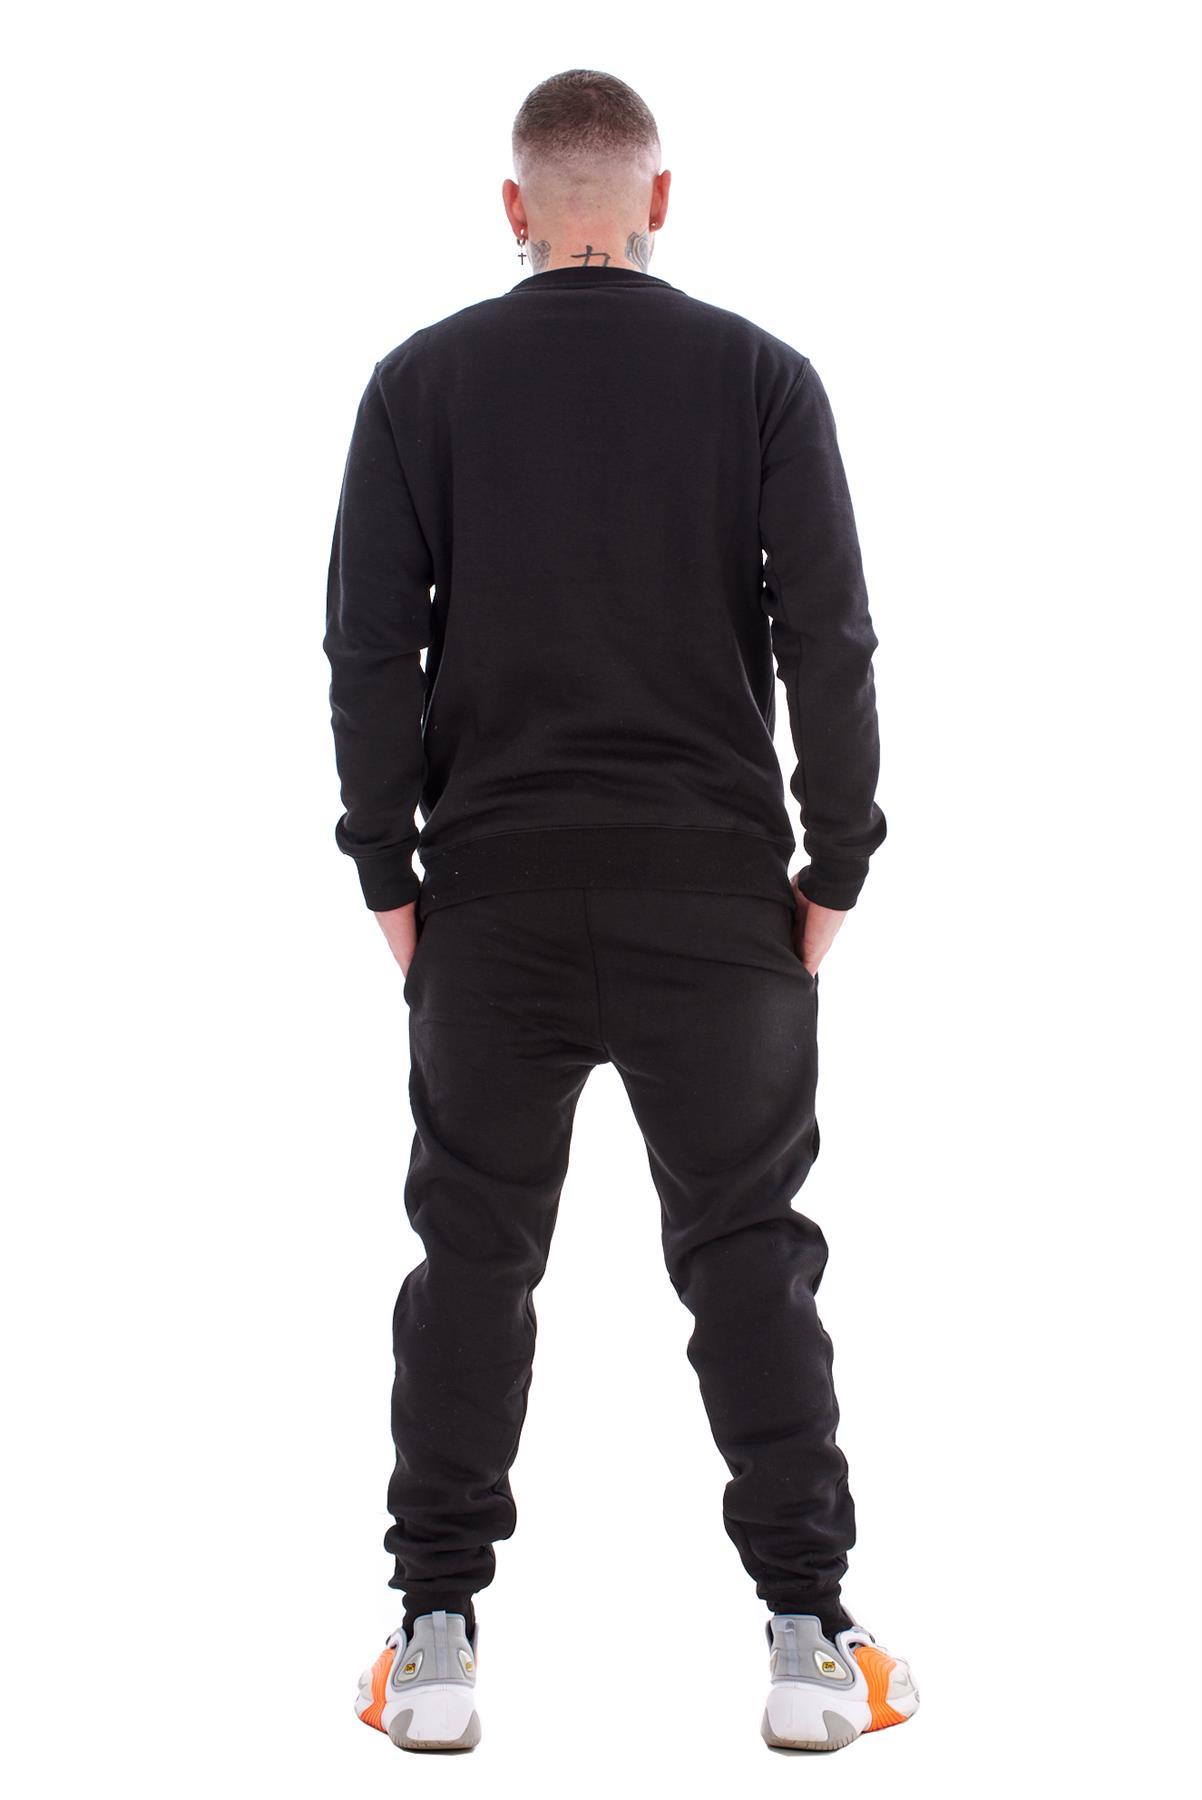 Mens-Plain-Tracksuit-Branded-Fleece-Pullover-Sweatshirts-Cotton-Jogging-Bottoms thumbnail 3